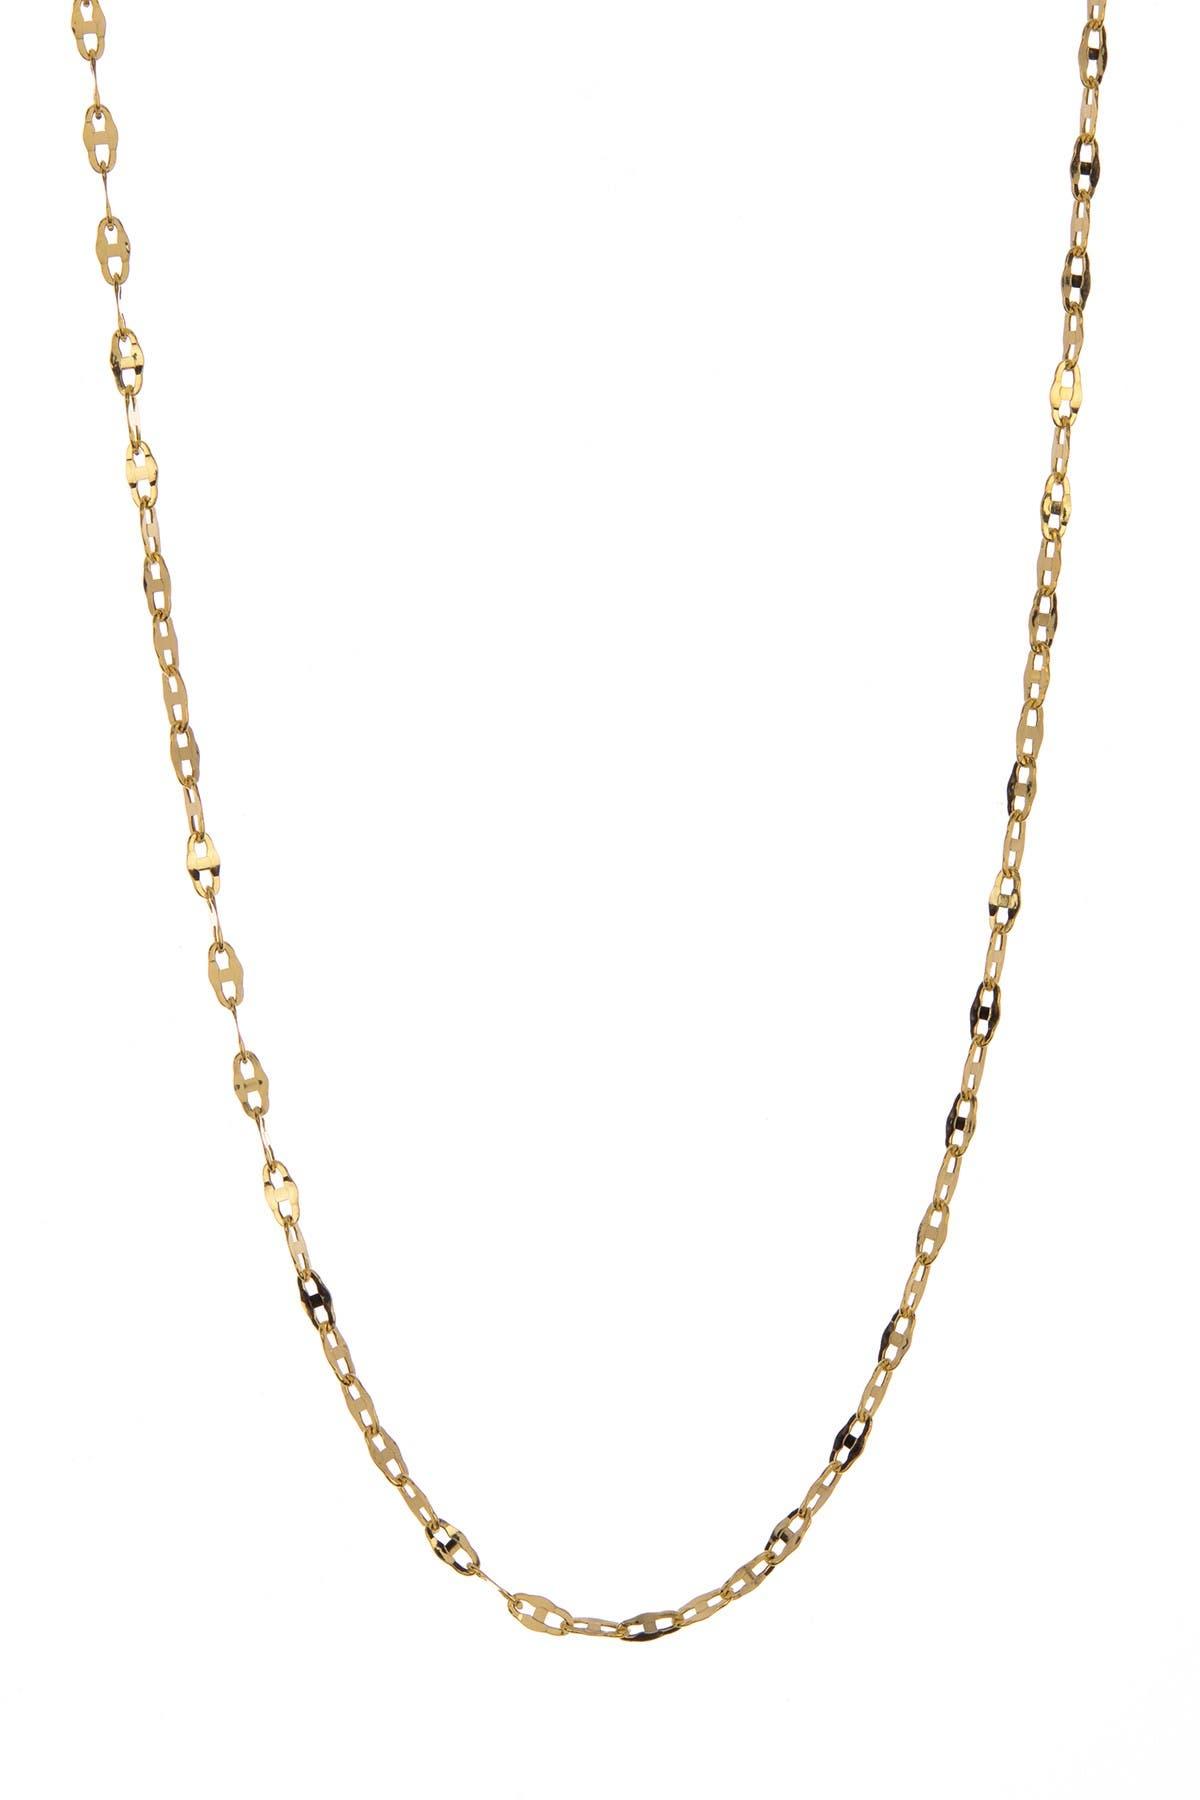 Image of Candela 10K Gold Marine Chain Necklace